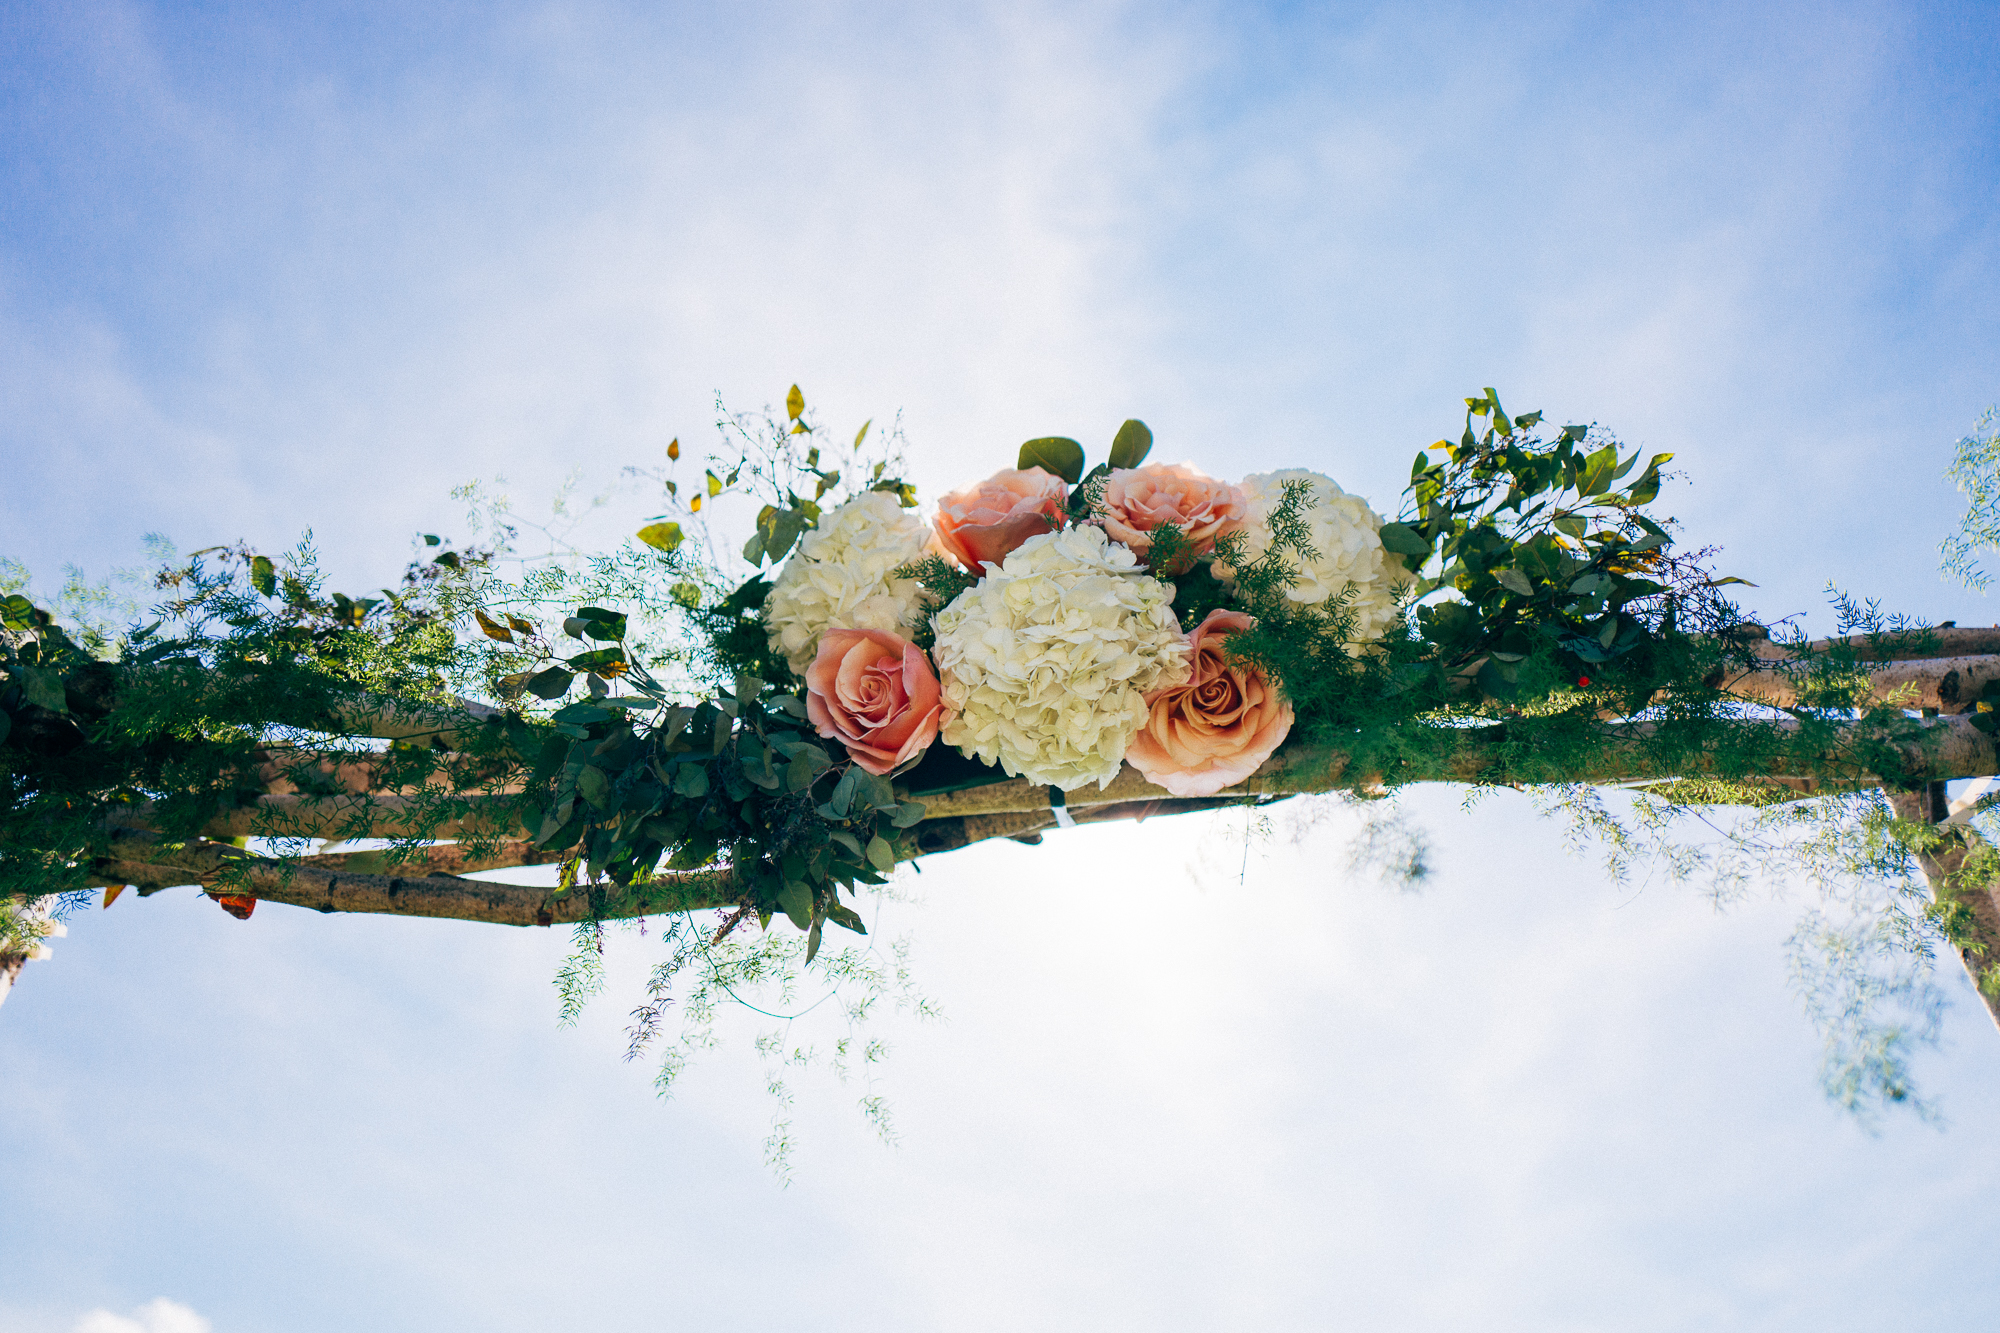 scranton-wedding-photography-zak-zavada-2016.06-rebeccaIan-0348.jpg